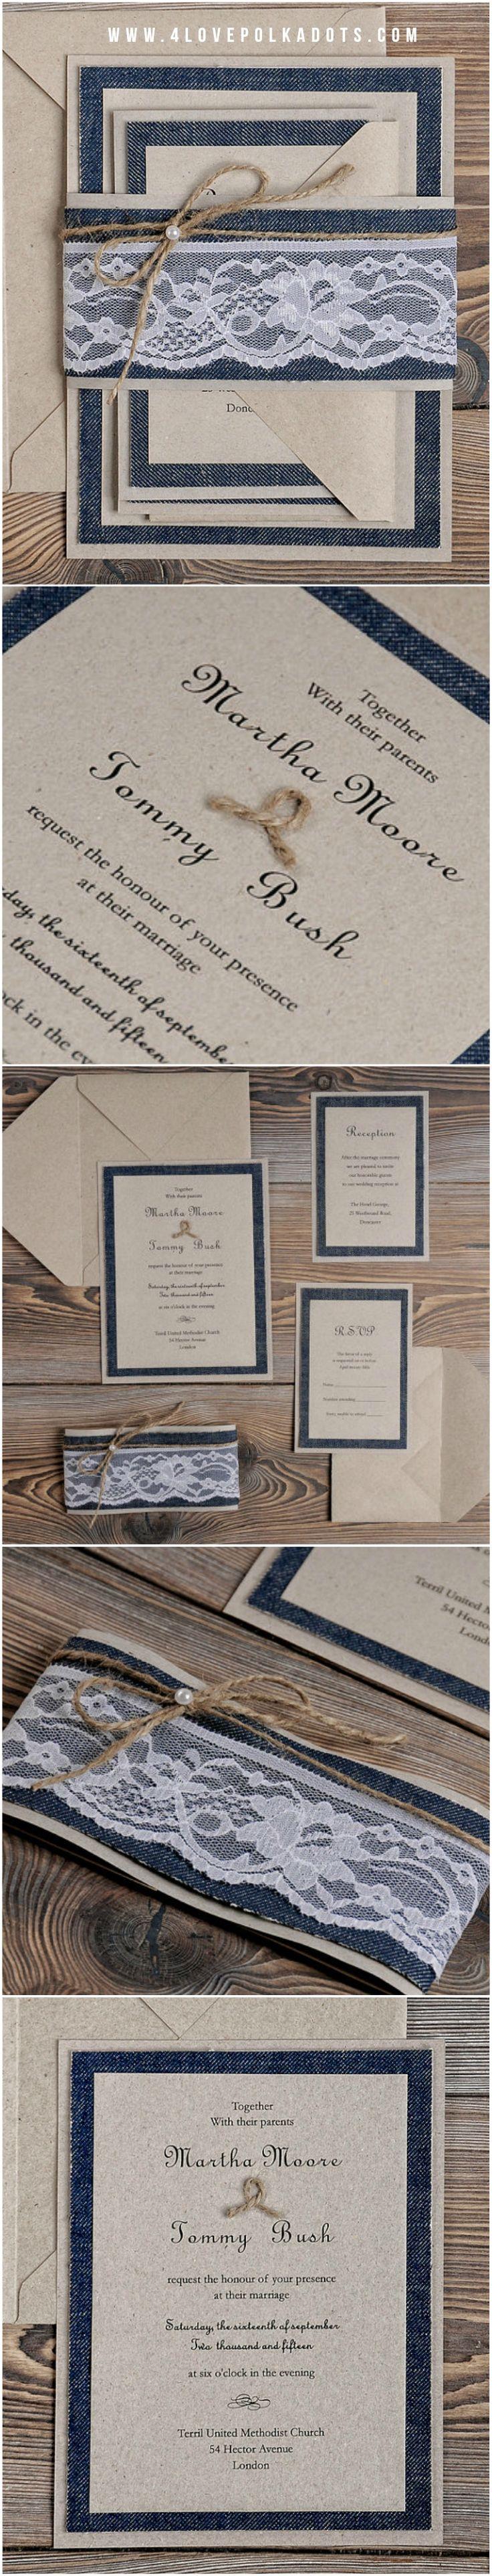 deer hunter wedding invitations%0A Jeans  u     Lace Wedding Invitation  eco kraft paper  lace and twine  jeans